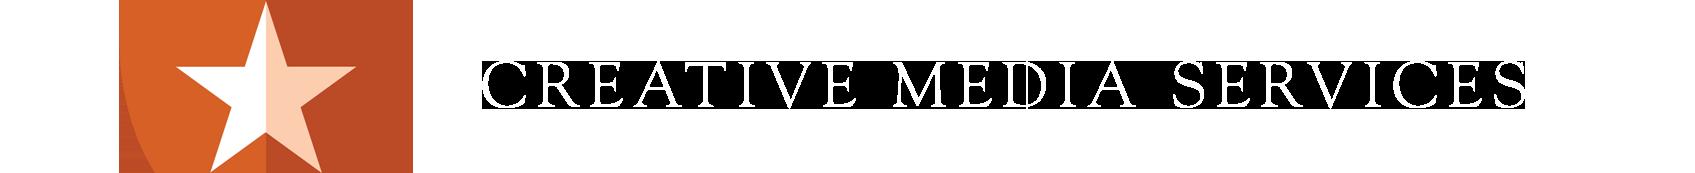 Creative Media Services